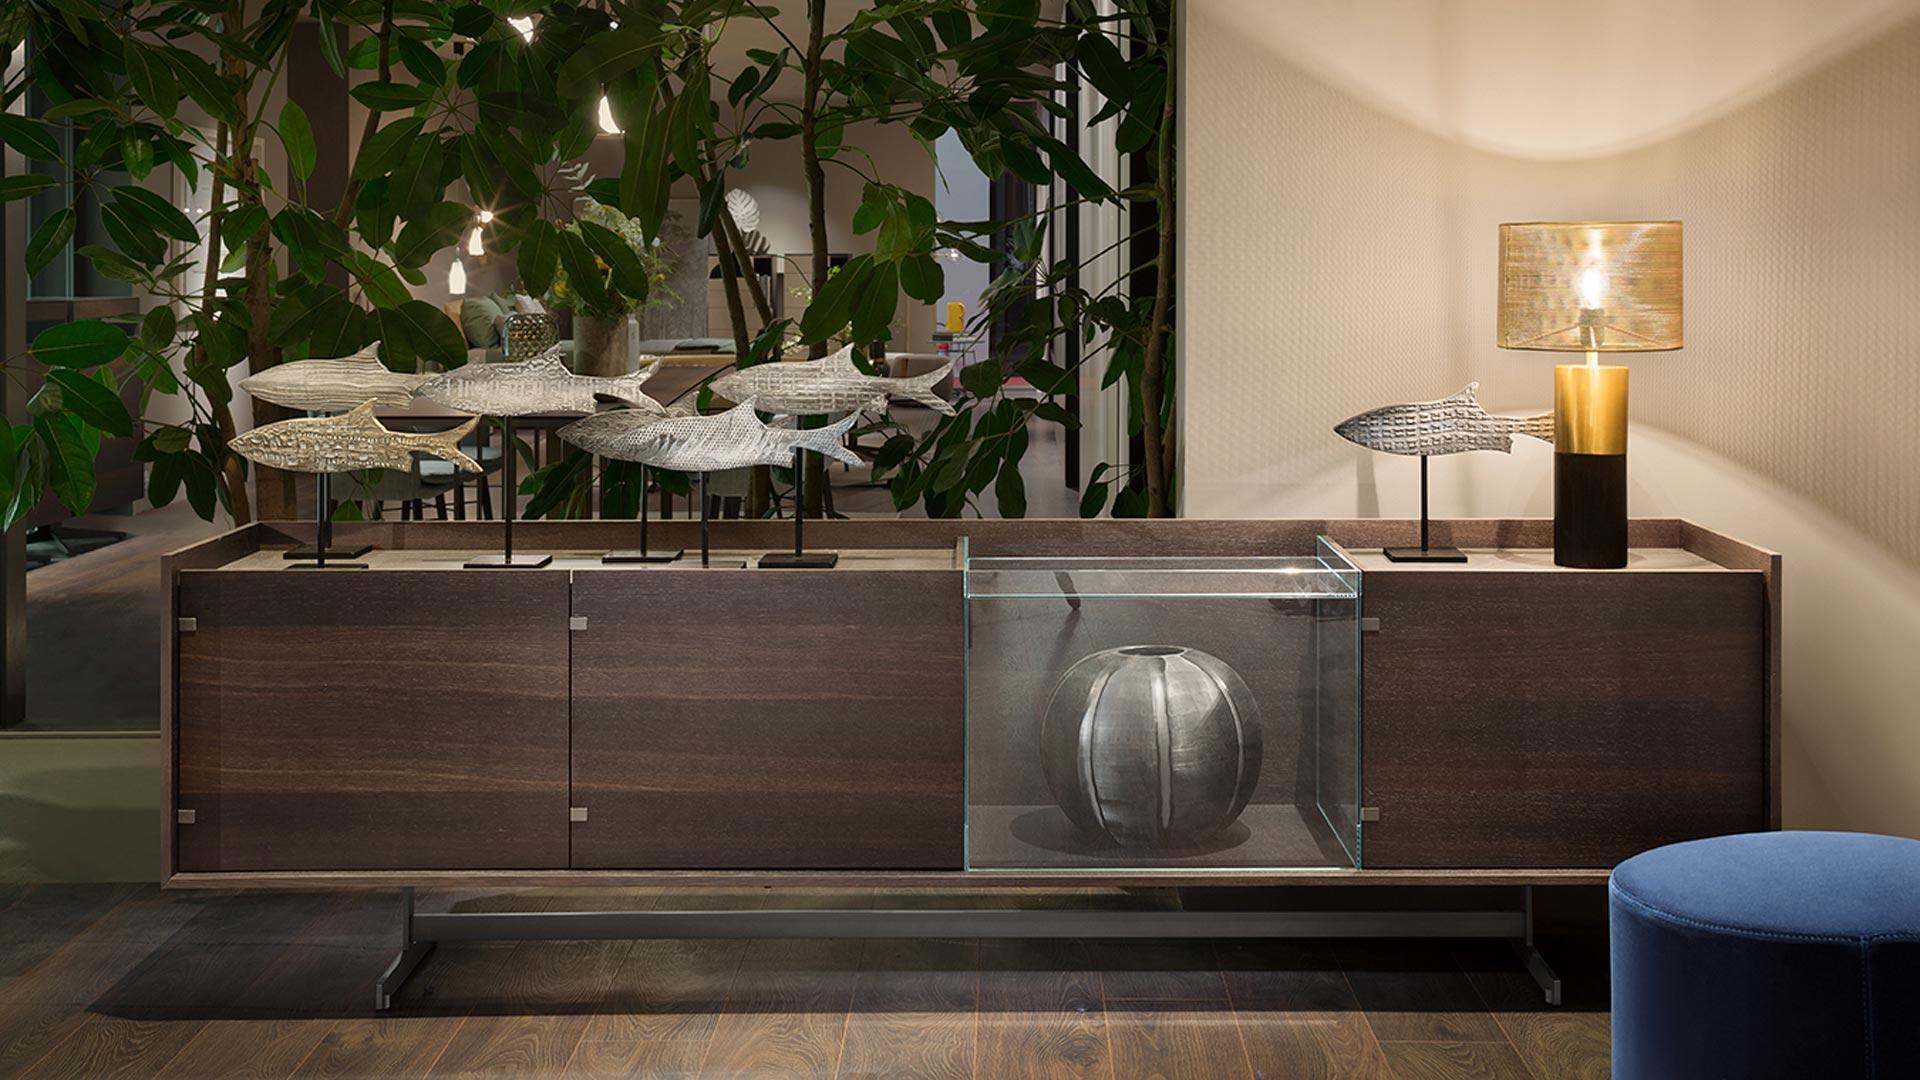 Living strippoli mobili corato home design kitchen and kids cucine camerette living - Lema mobili listino prezzi ...